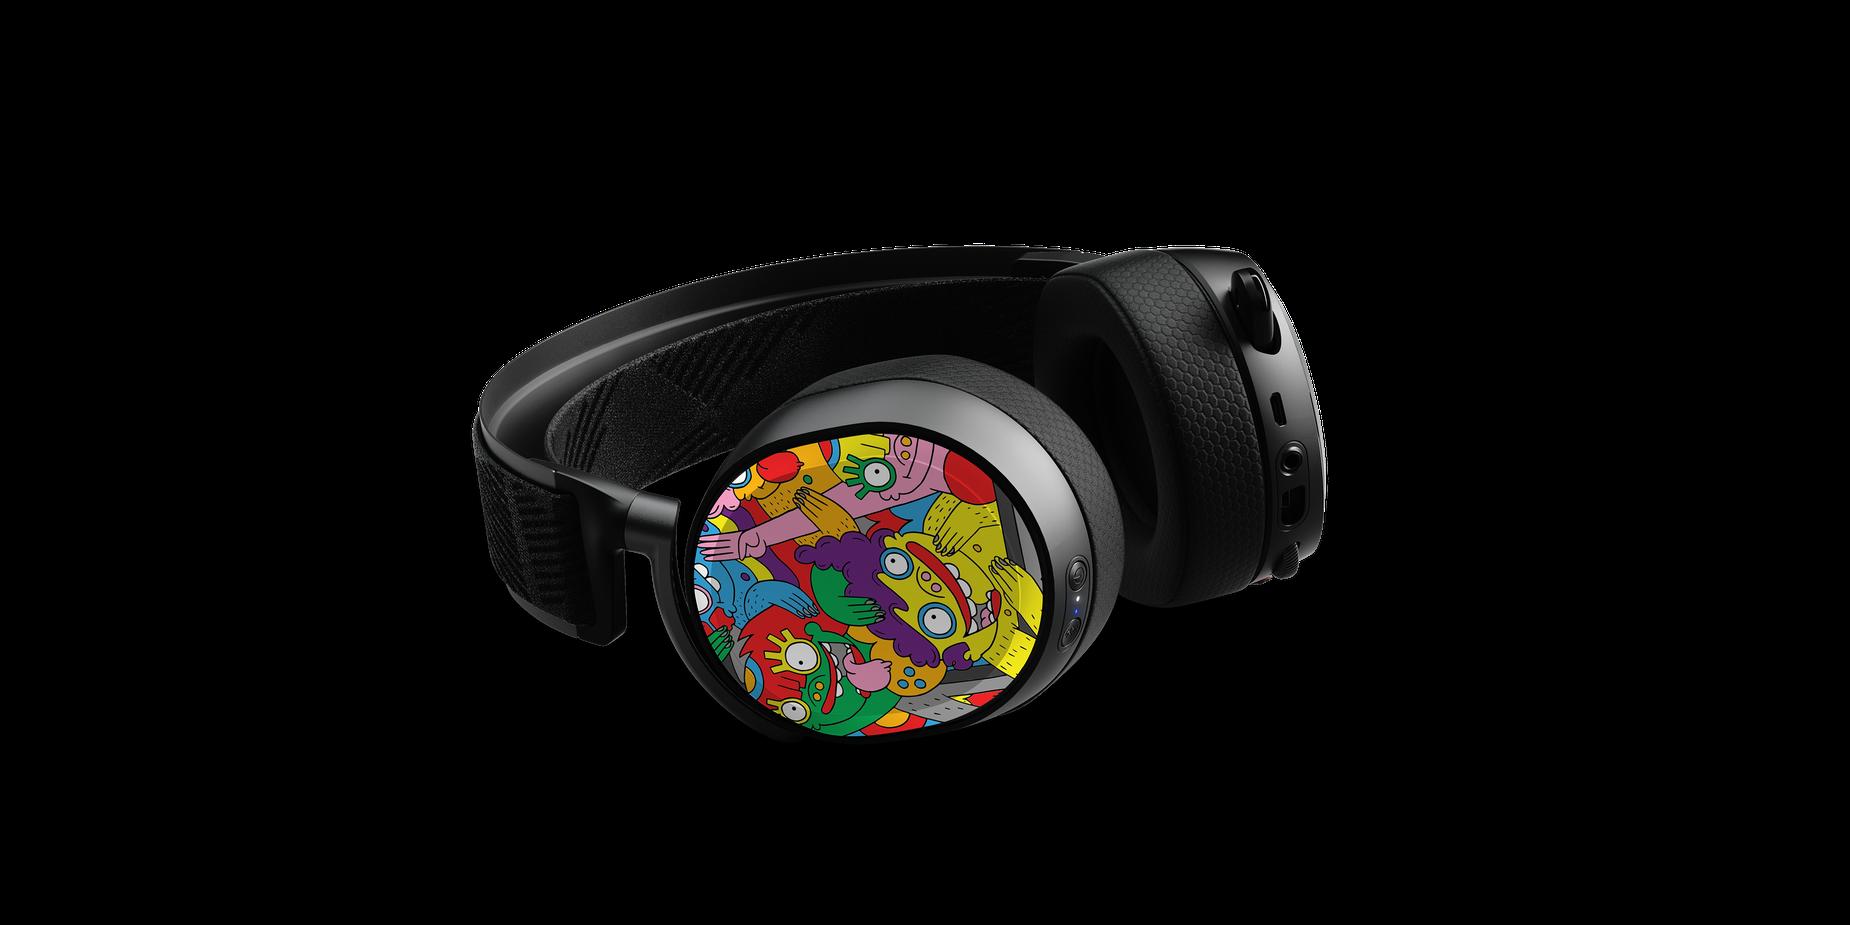 Arctis Pro speaker plates designed by artist Lauren Asta shown on a headset render lying flat